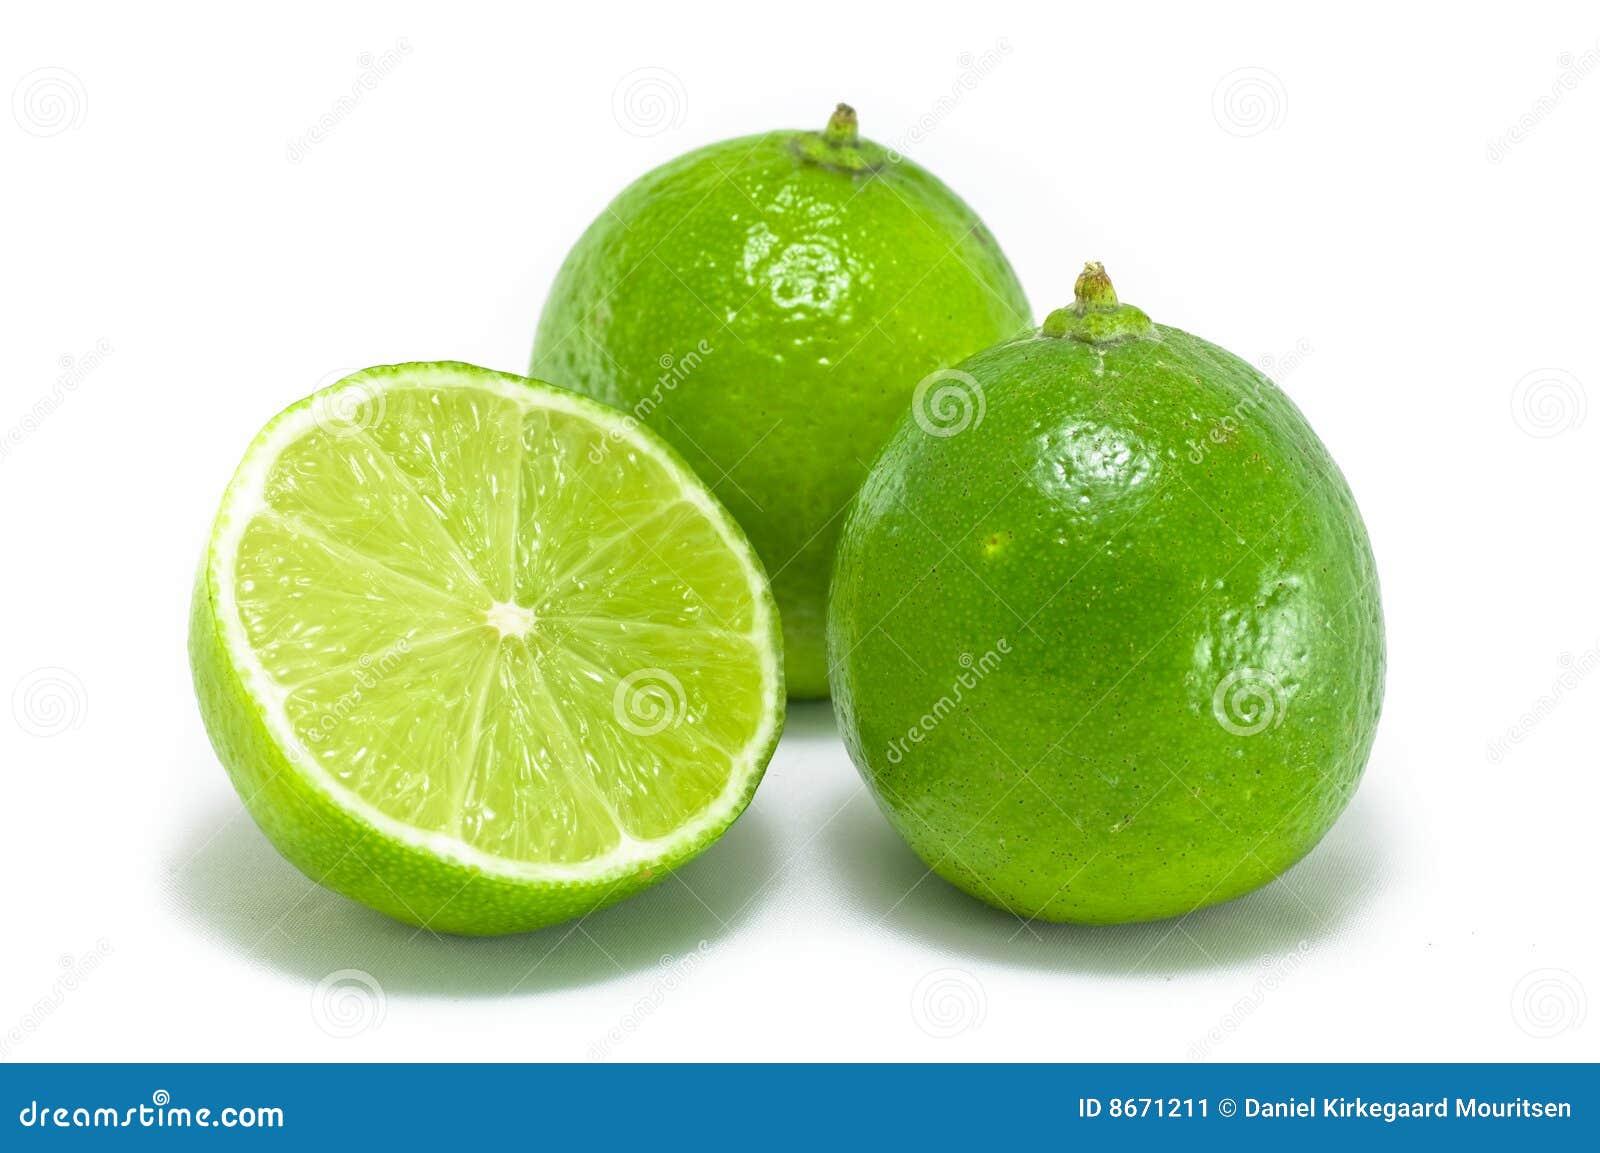 Lime fruits